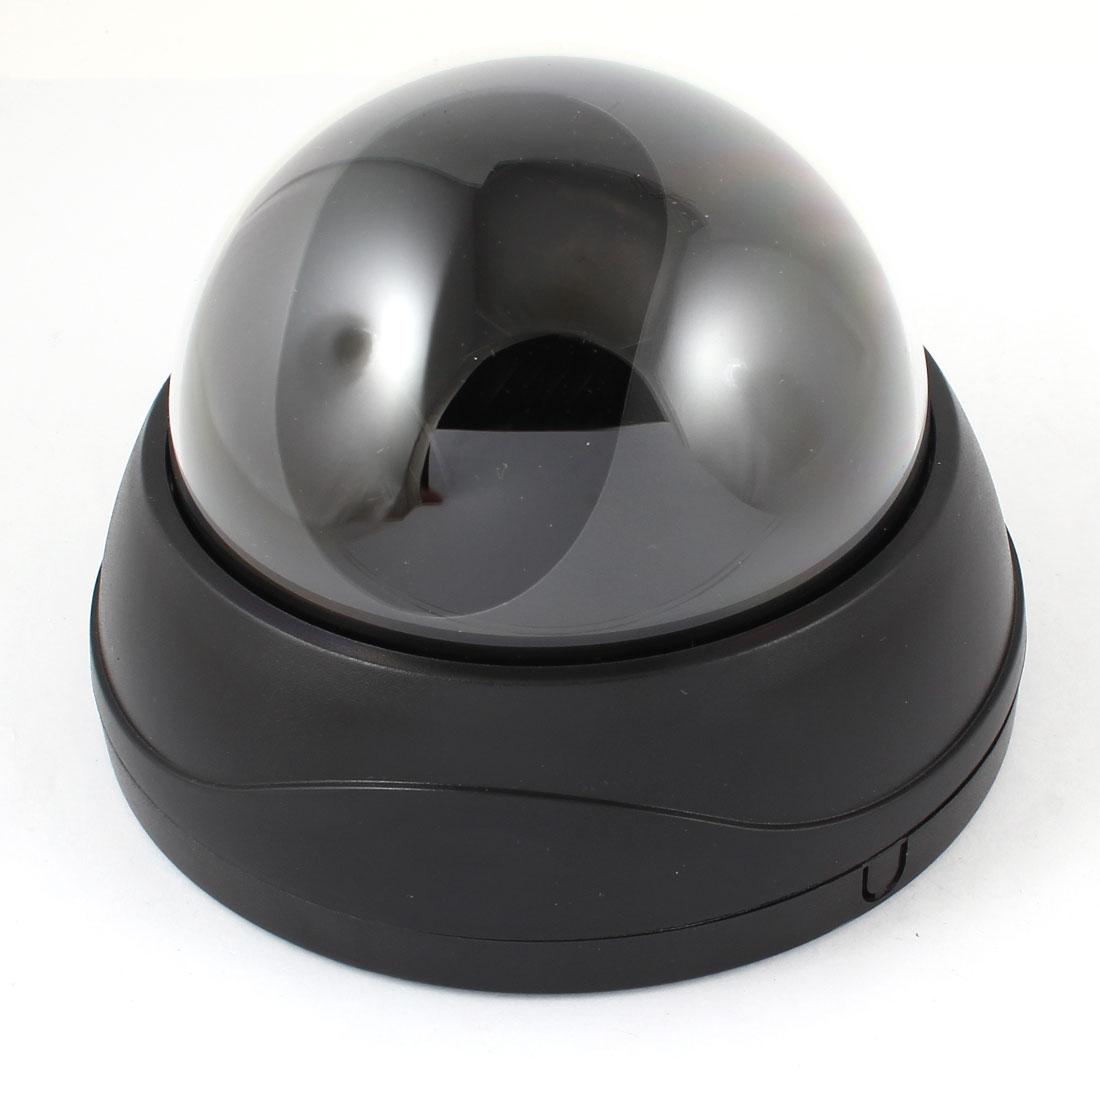 Surveillance Black Plastic CCTV Dome Camera Housing Case 13cm Dia